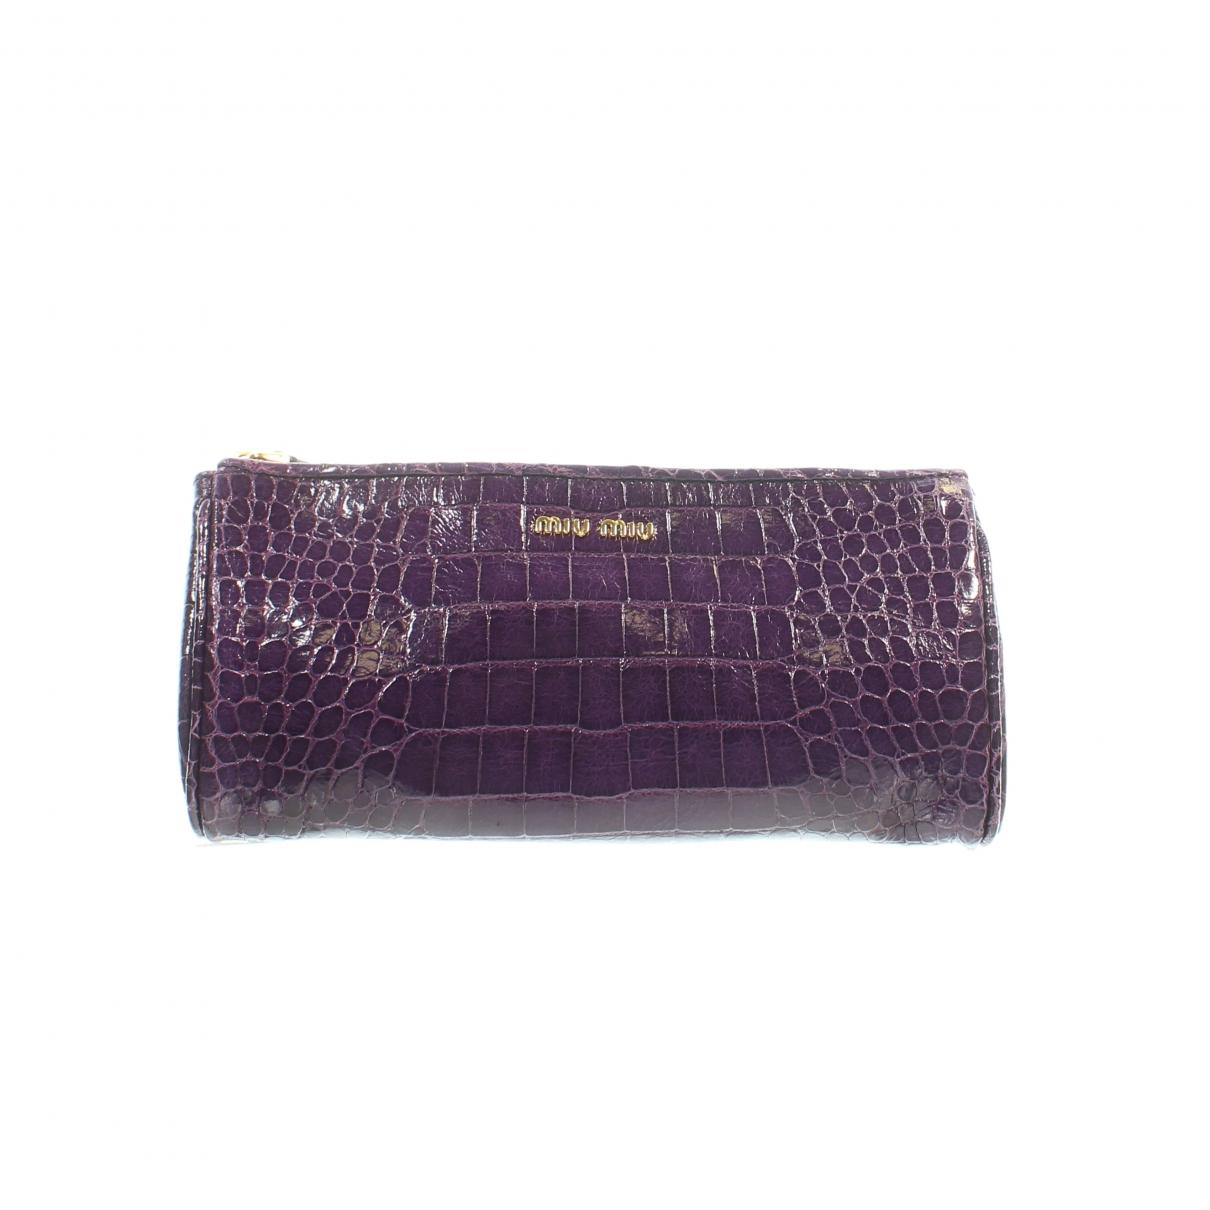 Miu Miu \N Purple Leather Clutch bag for Women \N